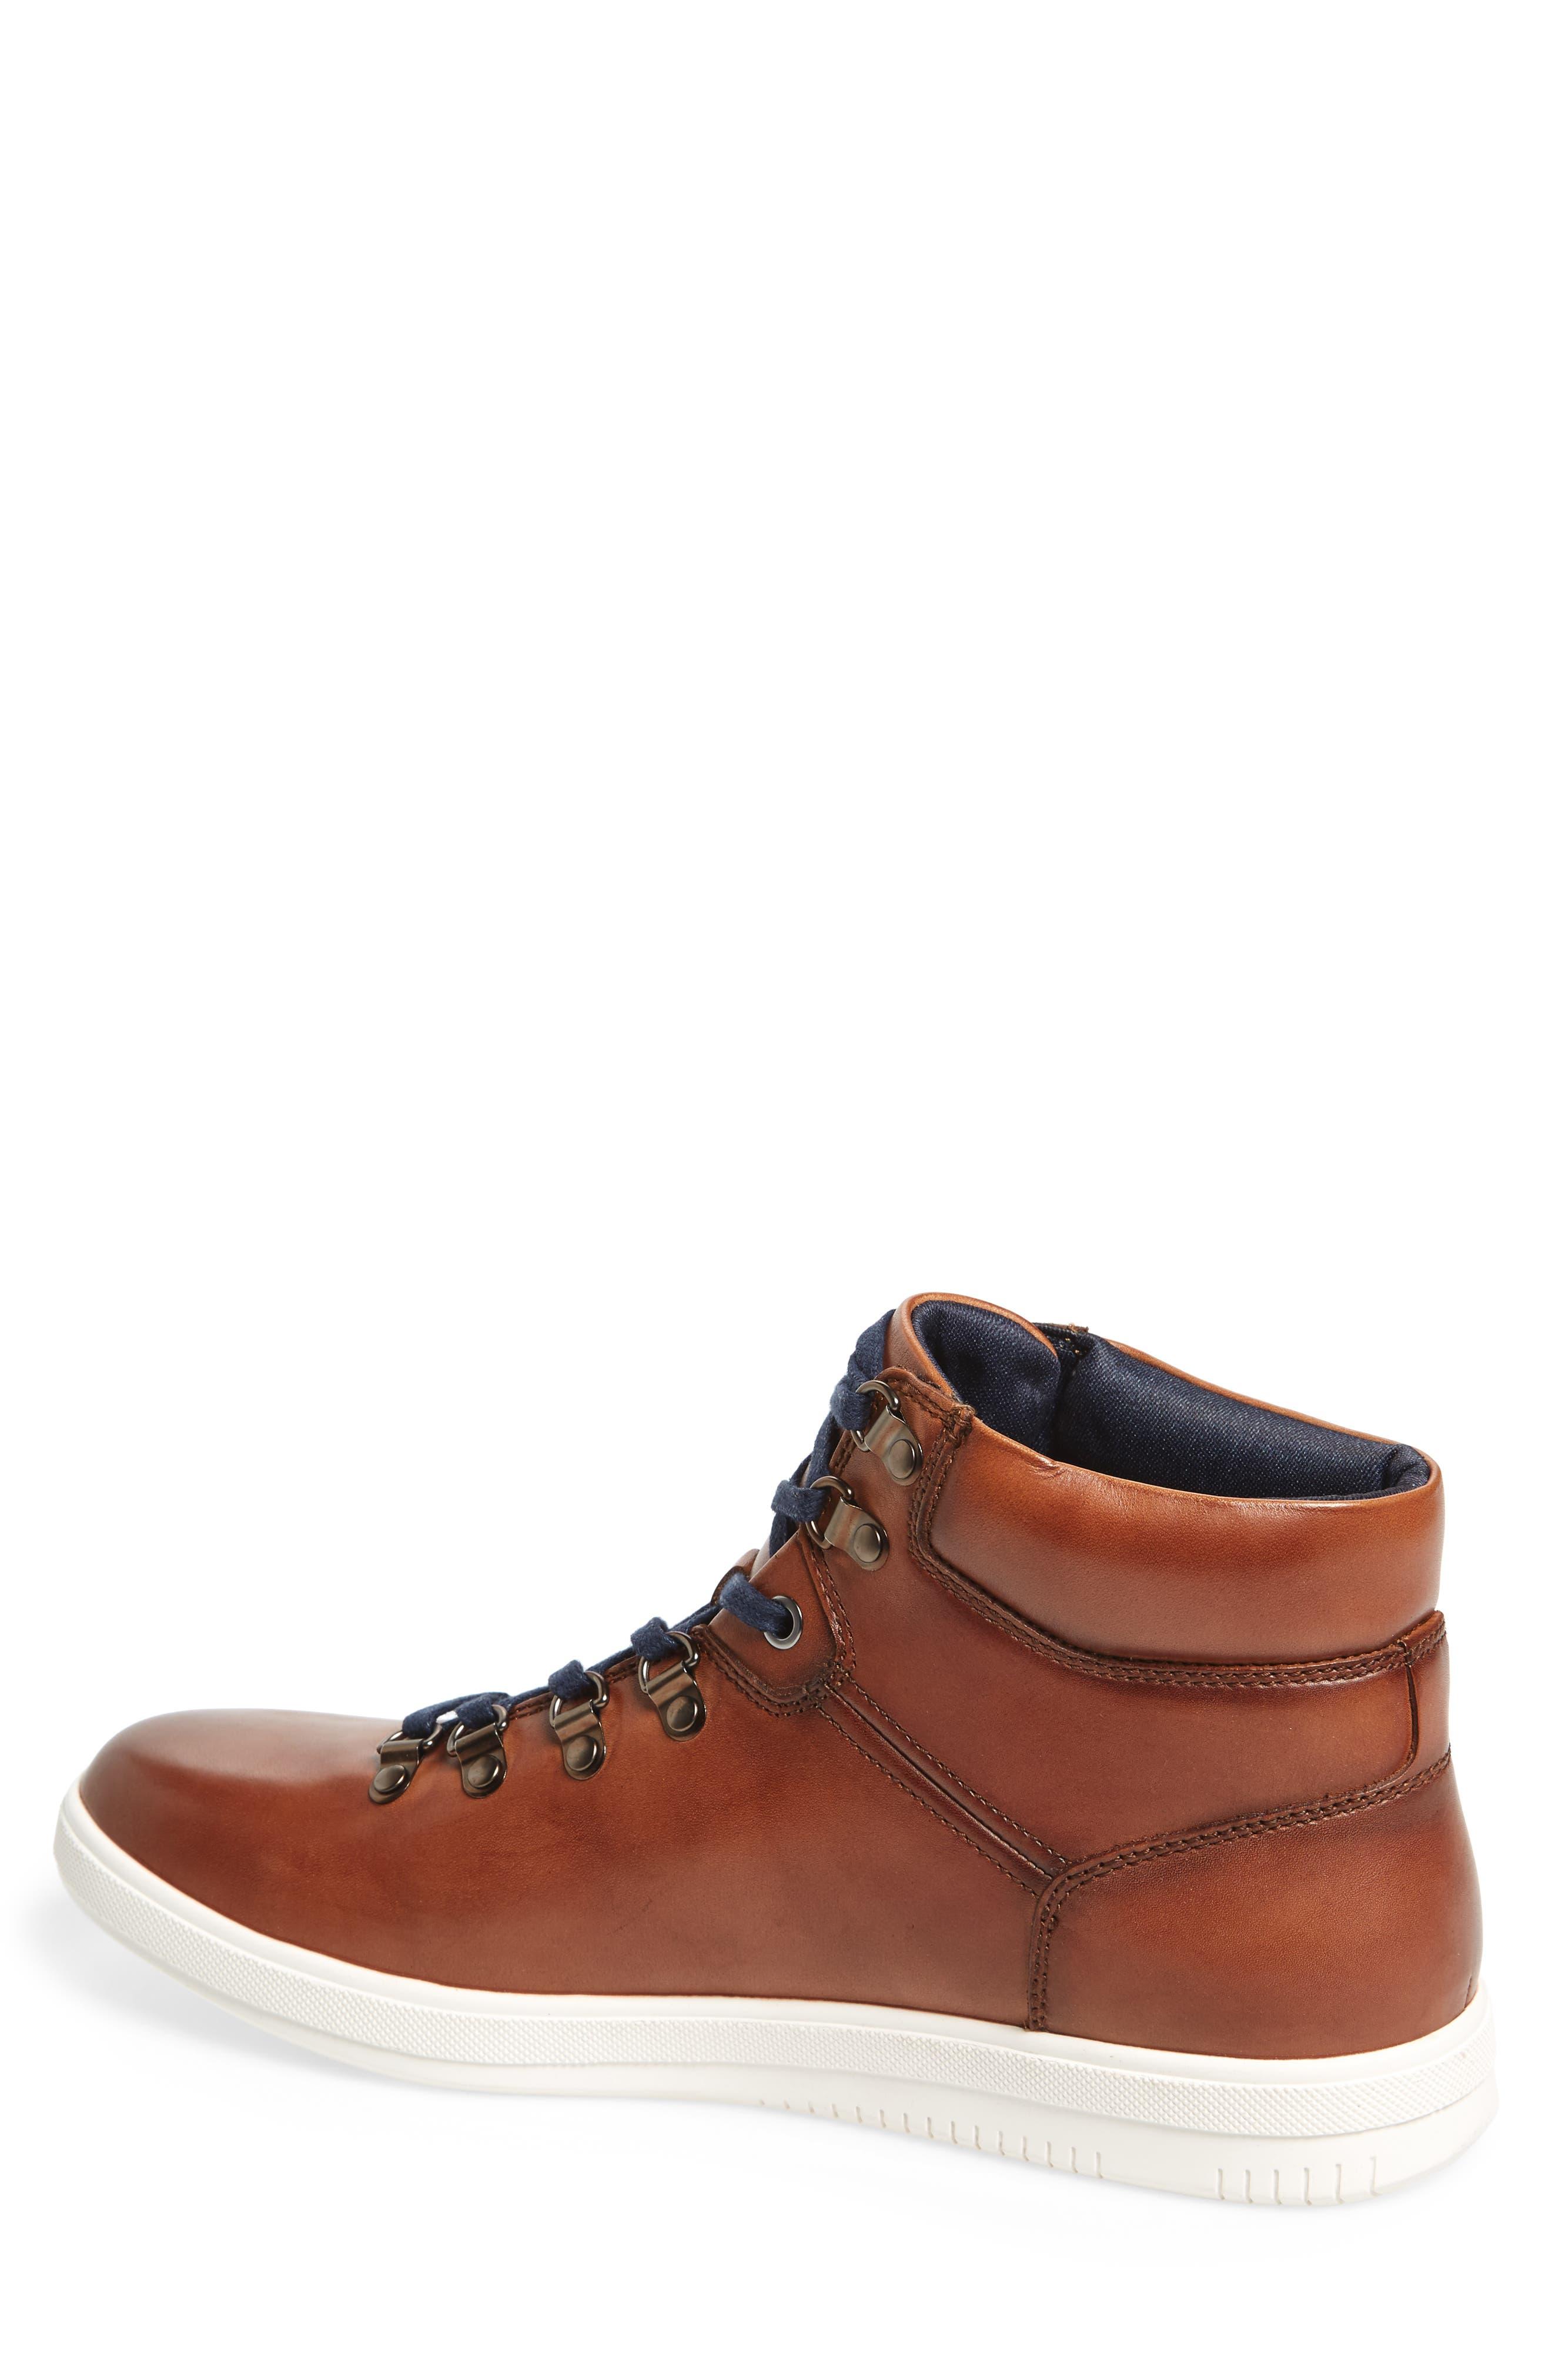 Slow Joe Mid Top Sneaker,                             Alternate thumbnail 2, color,                             Tan Leather